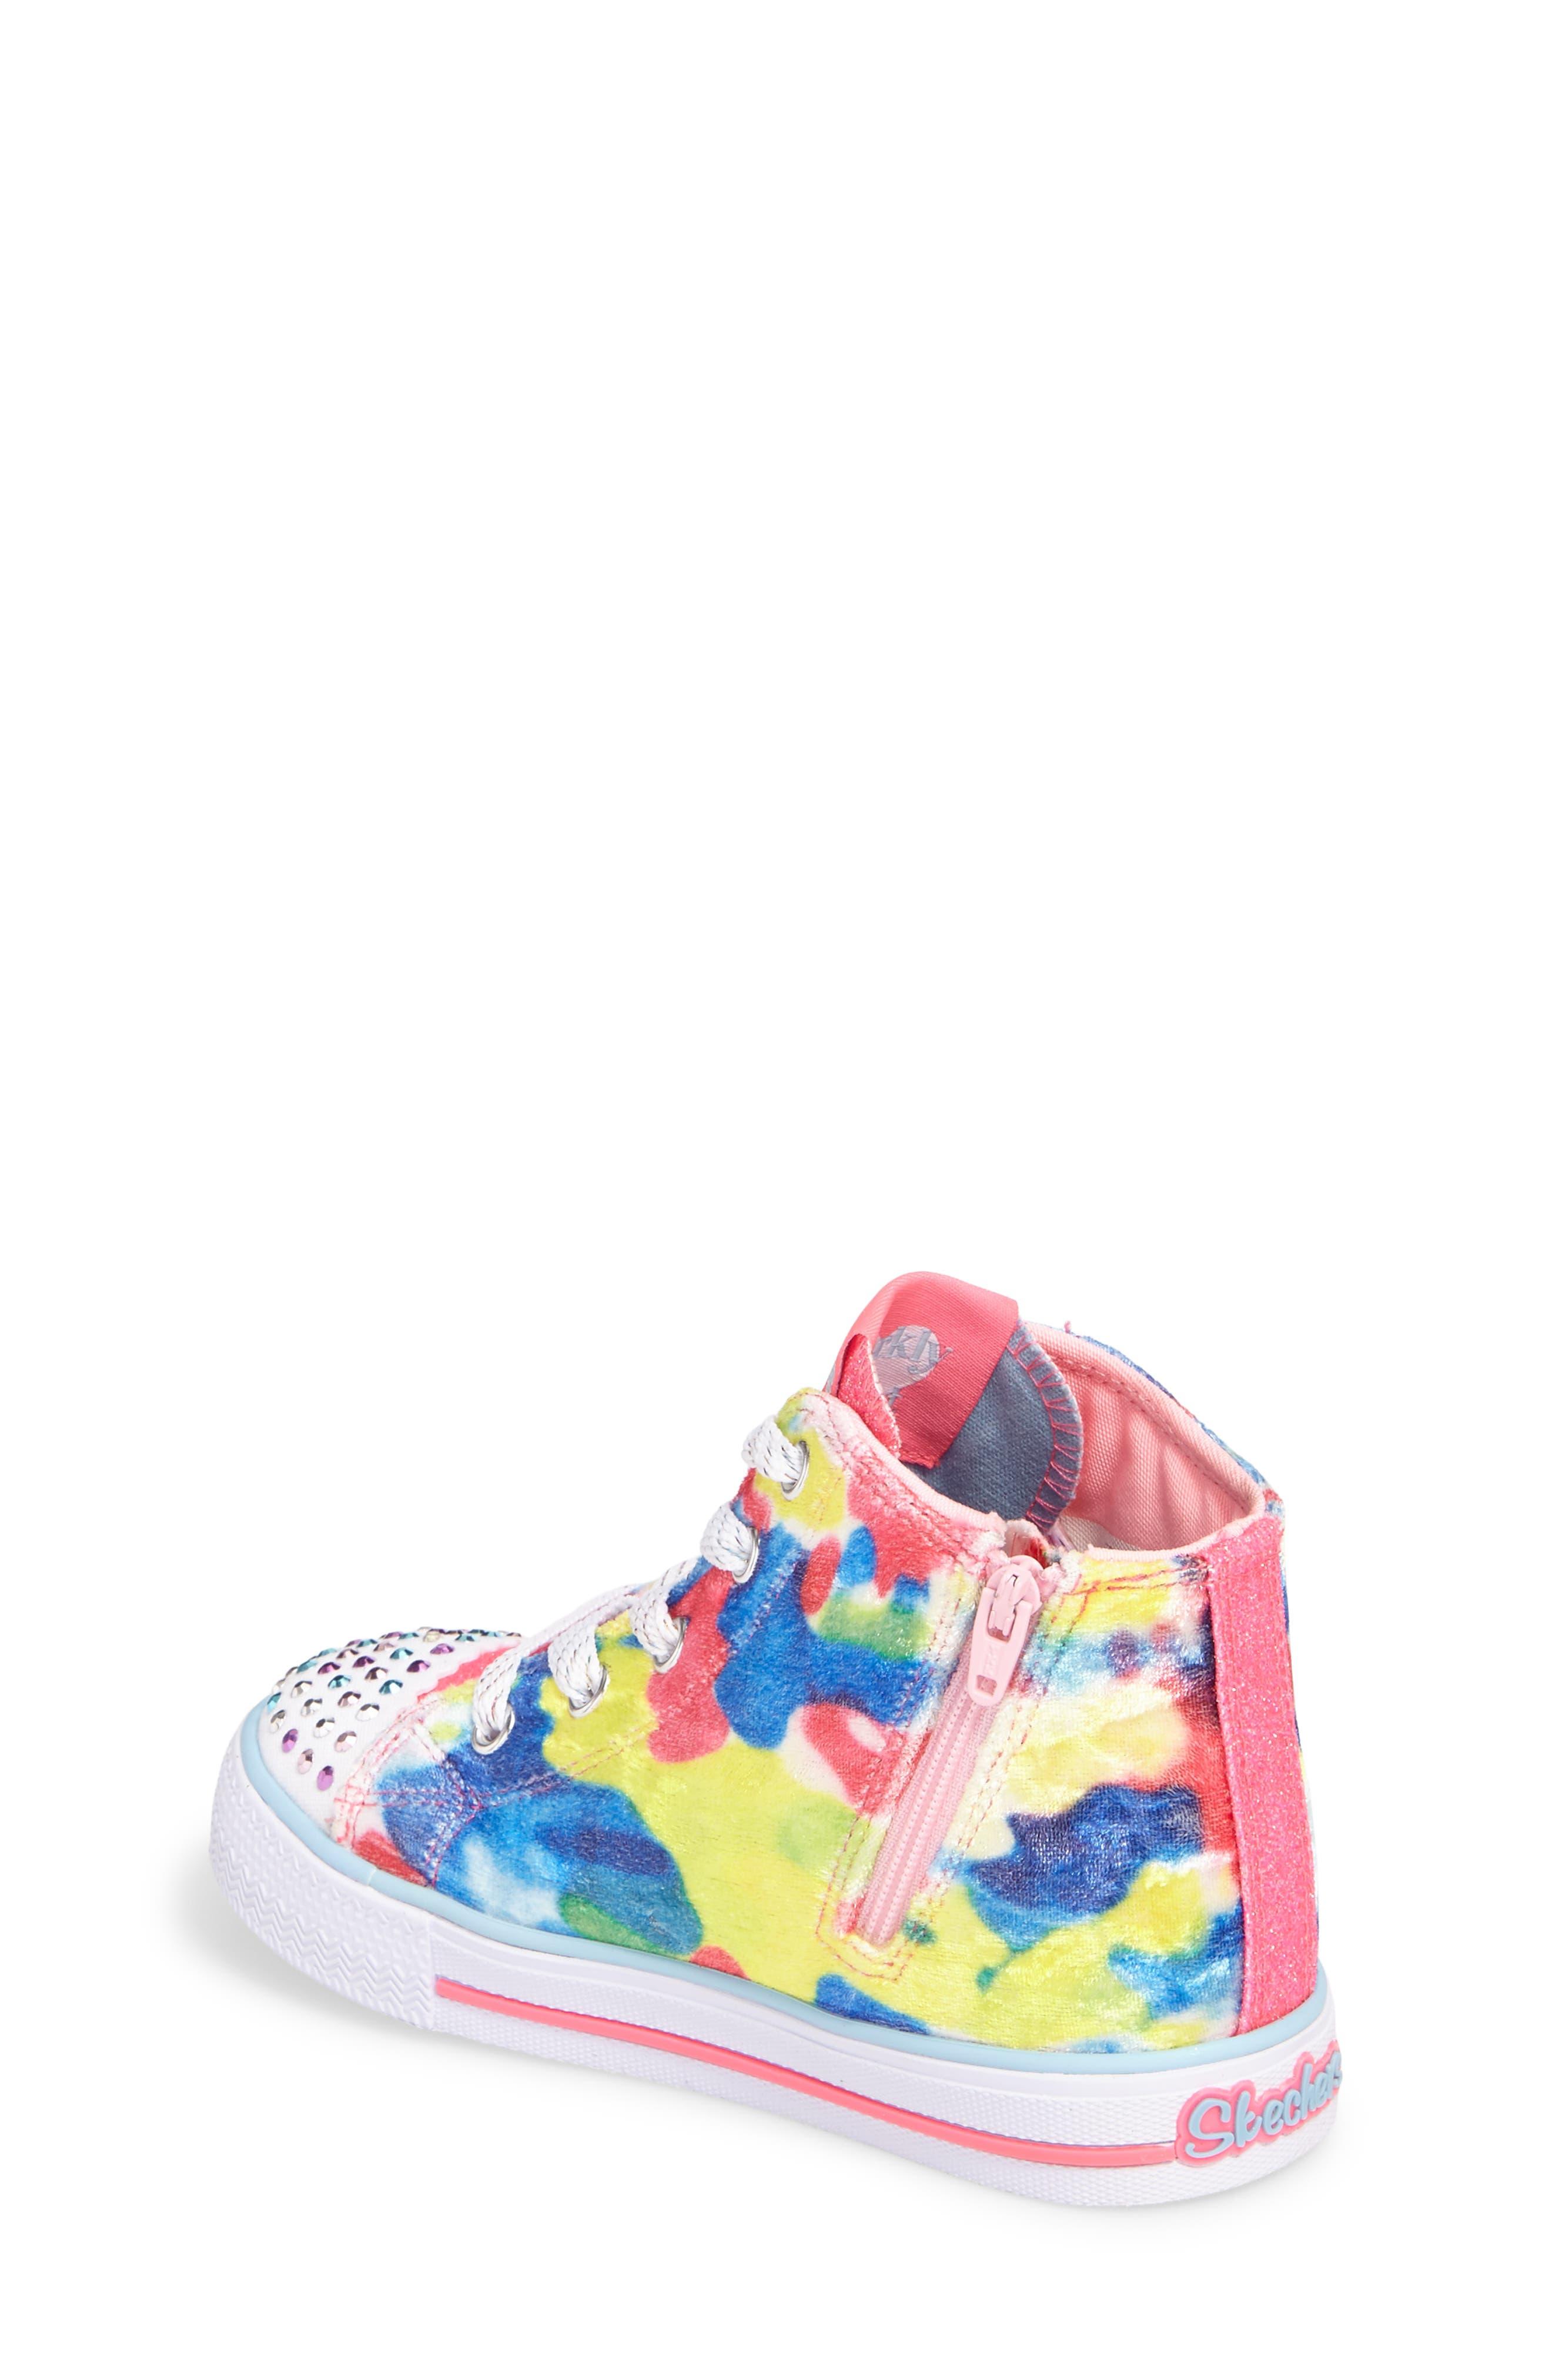 Alternate Image 2  - SKECHERS Twinkle Toes Shuffles Light-Up High Top Sneaker (Walker & Toddler)